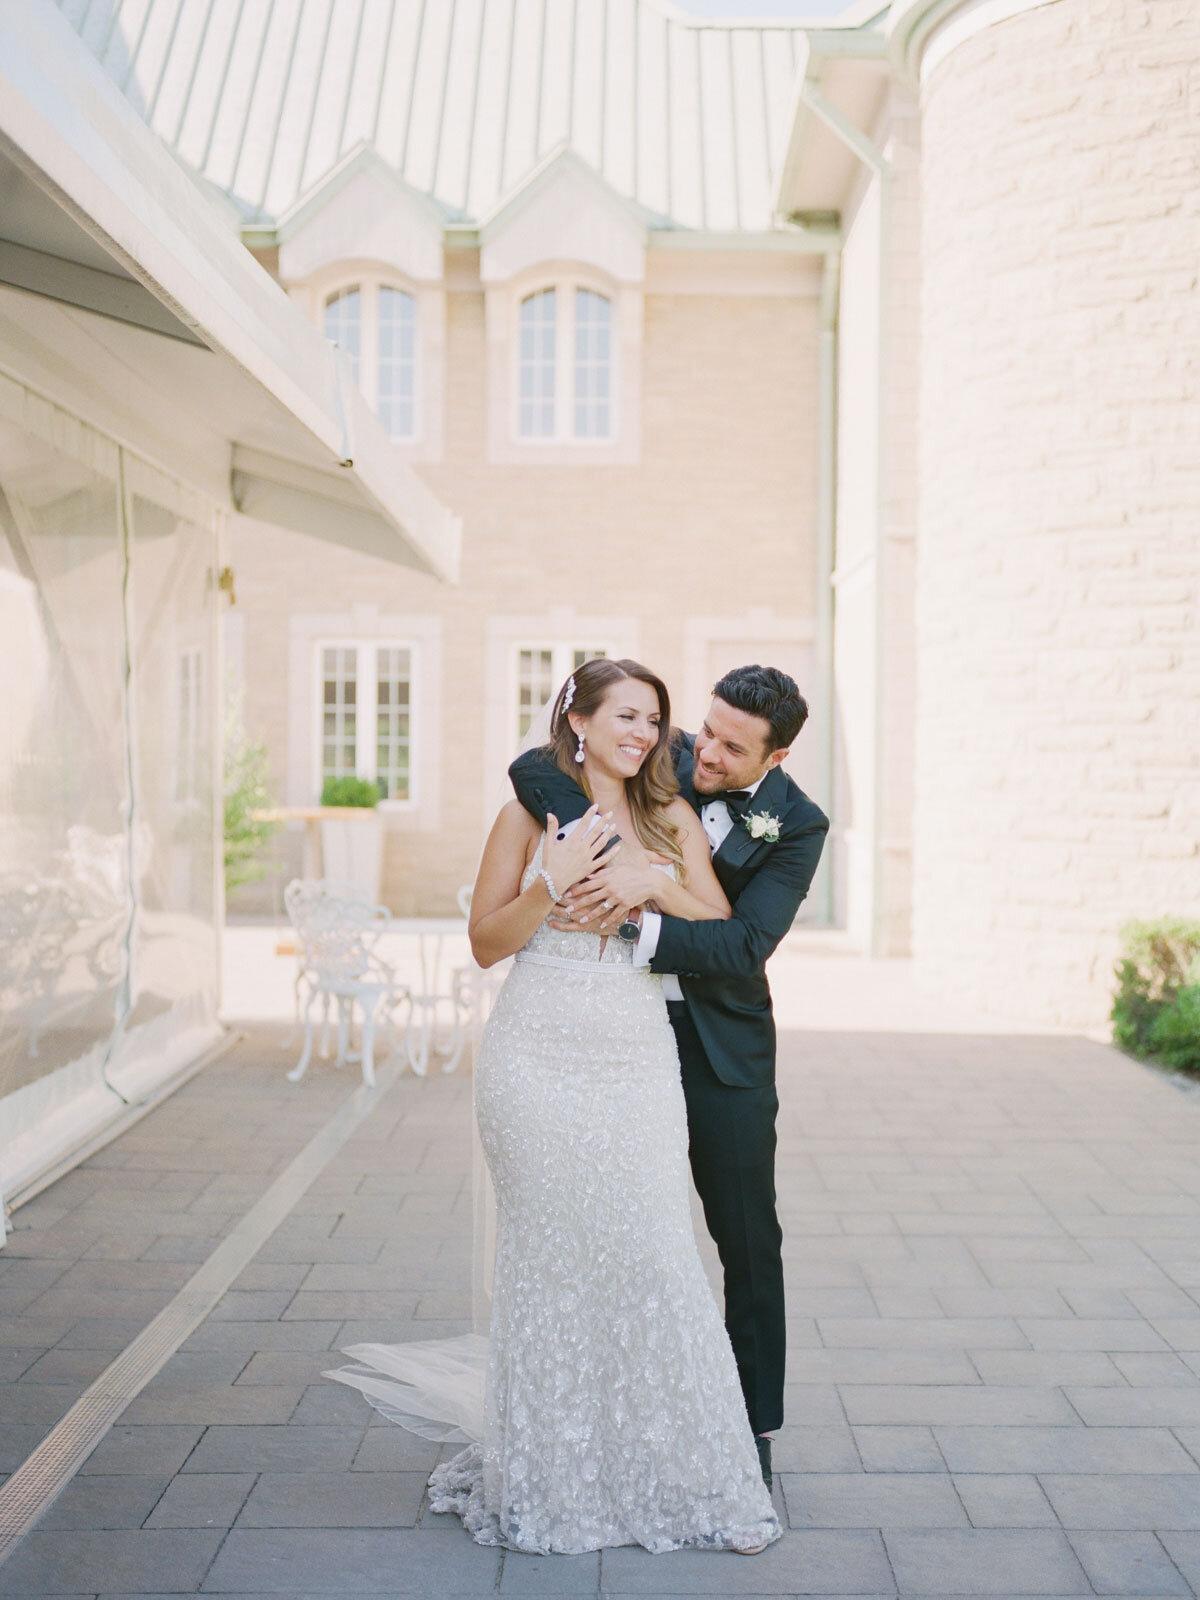 Chateau-des-Charmes-Wedding-Summer-Vineyard-Bride-Niagara-on-the-Lake-photos-by-Gemini-Photography-Ontario-0045.jpg